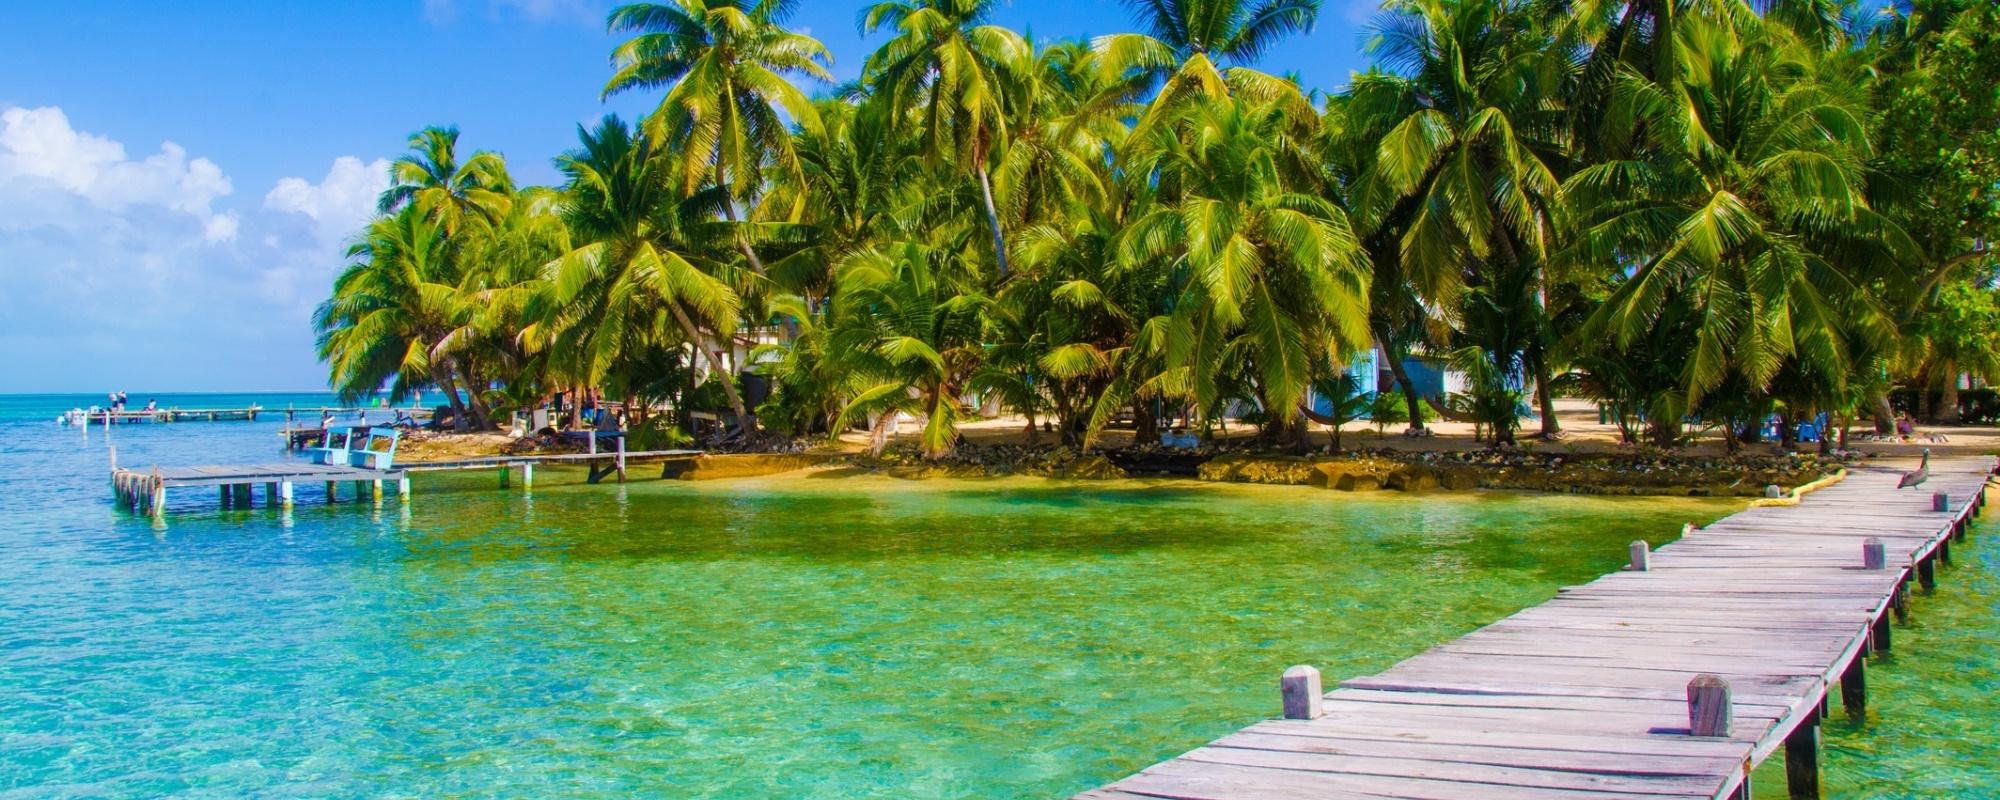 Dock in Belize